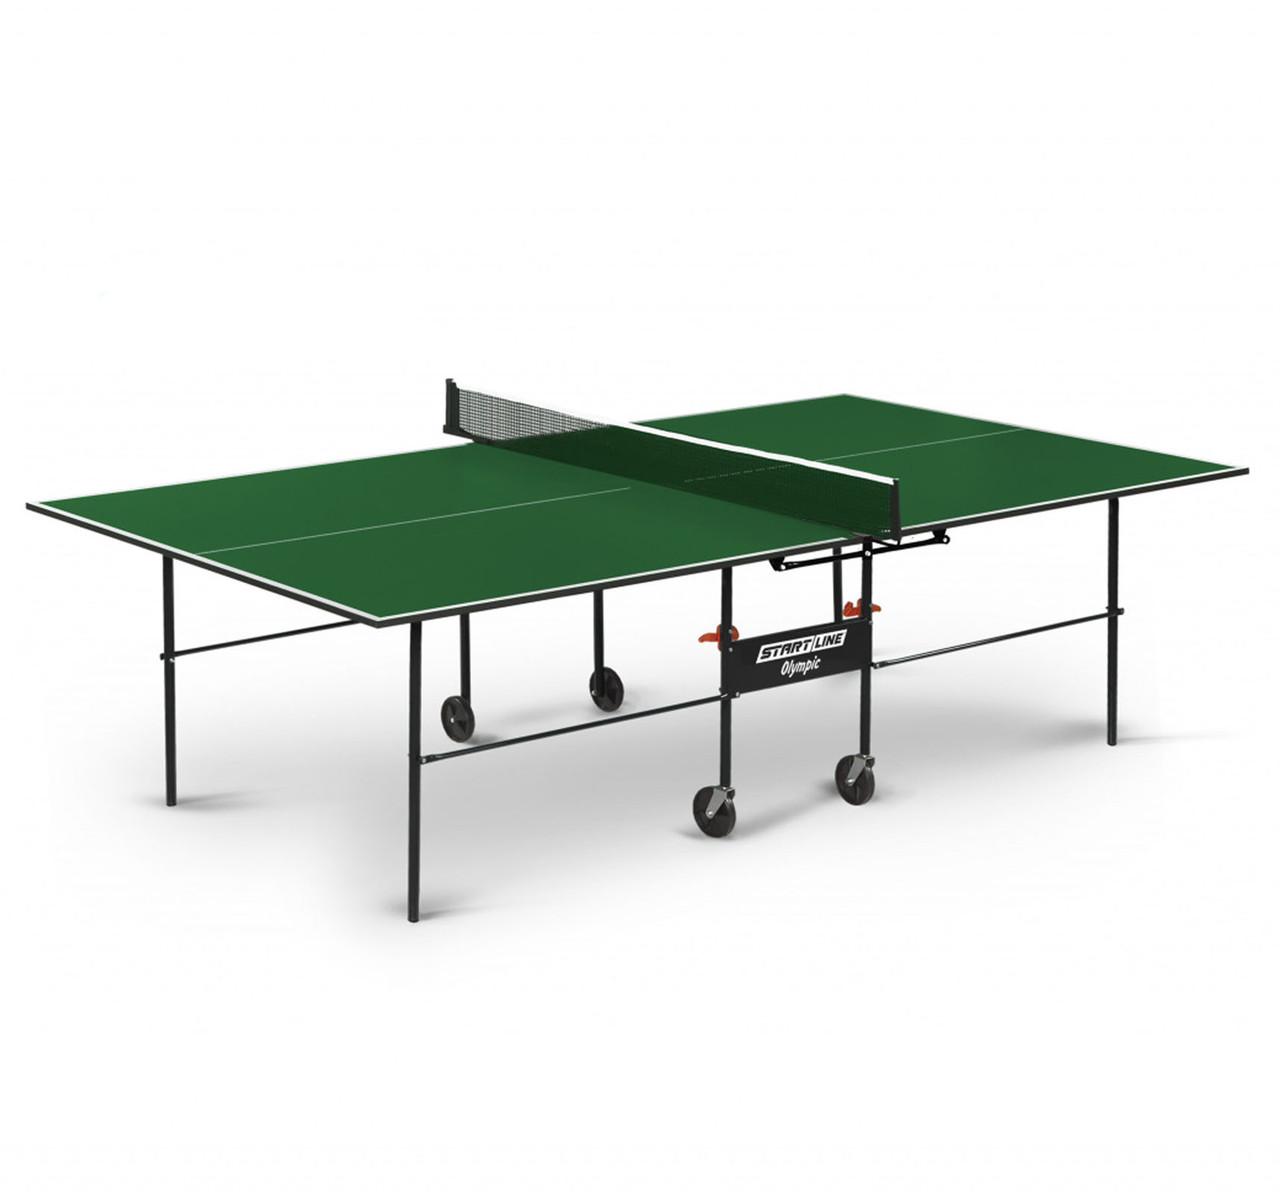 Теннисный стол Start line OLYMPIC Green - фото 1